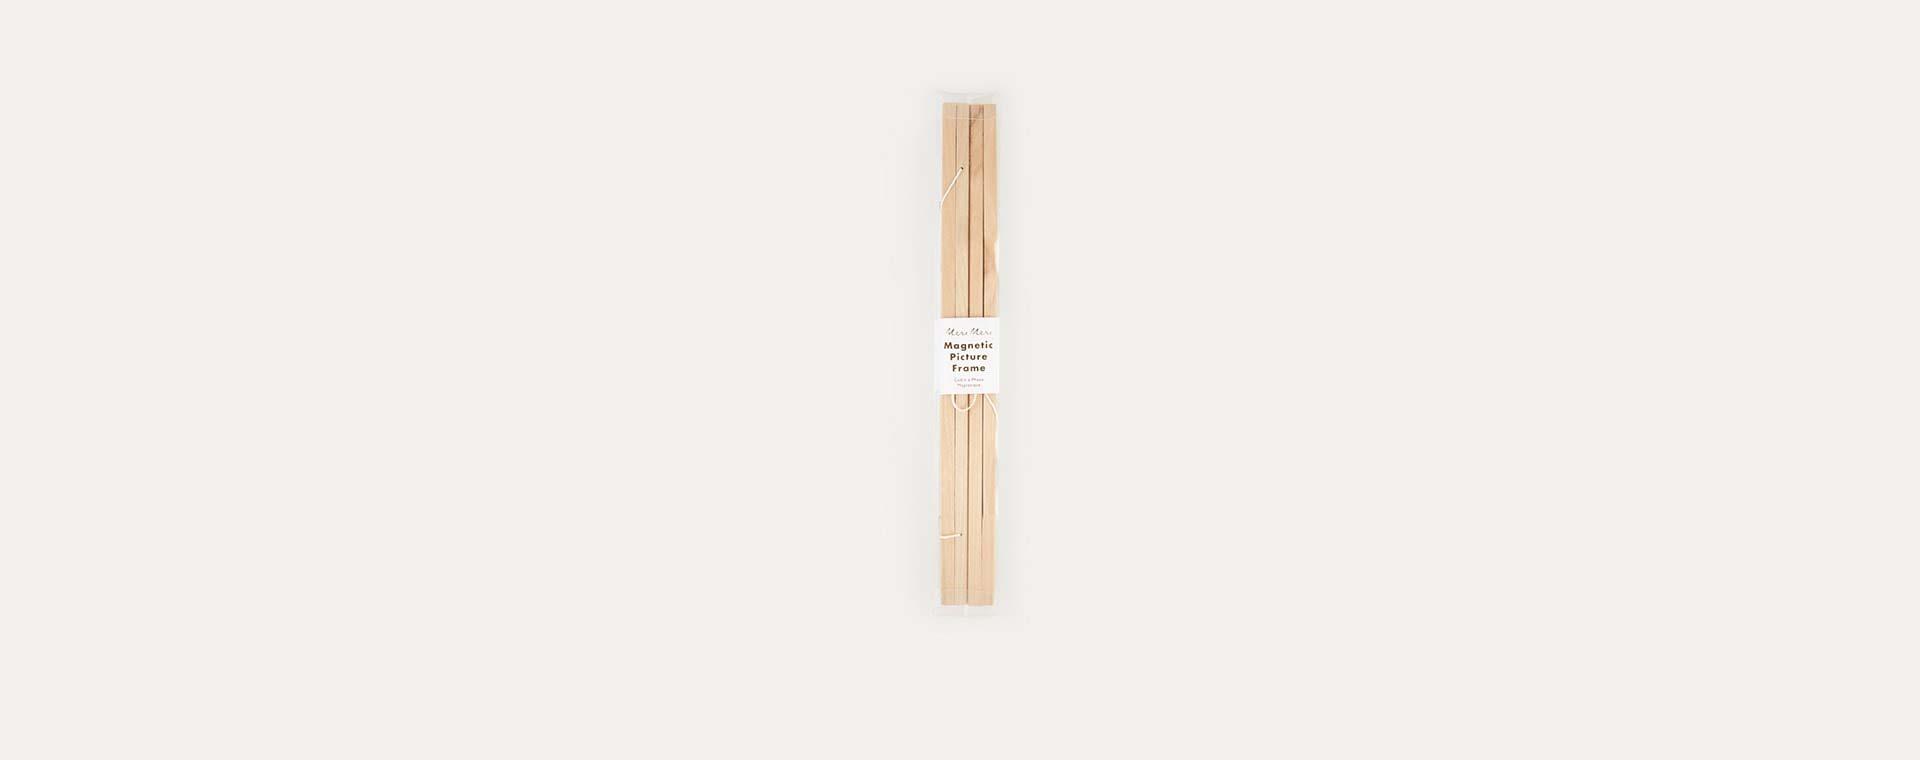 Beech Wood Meri Meri Magnetic Picture Frame